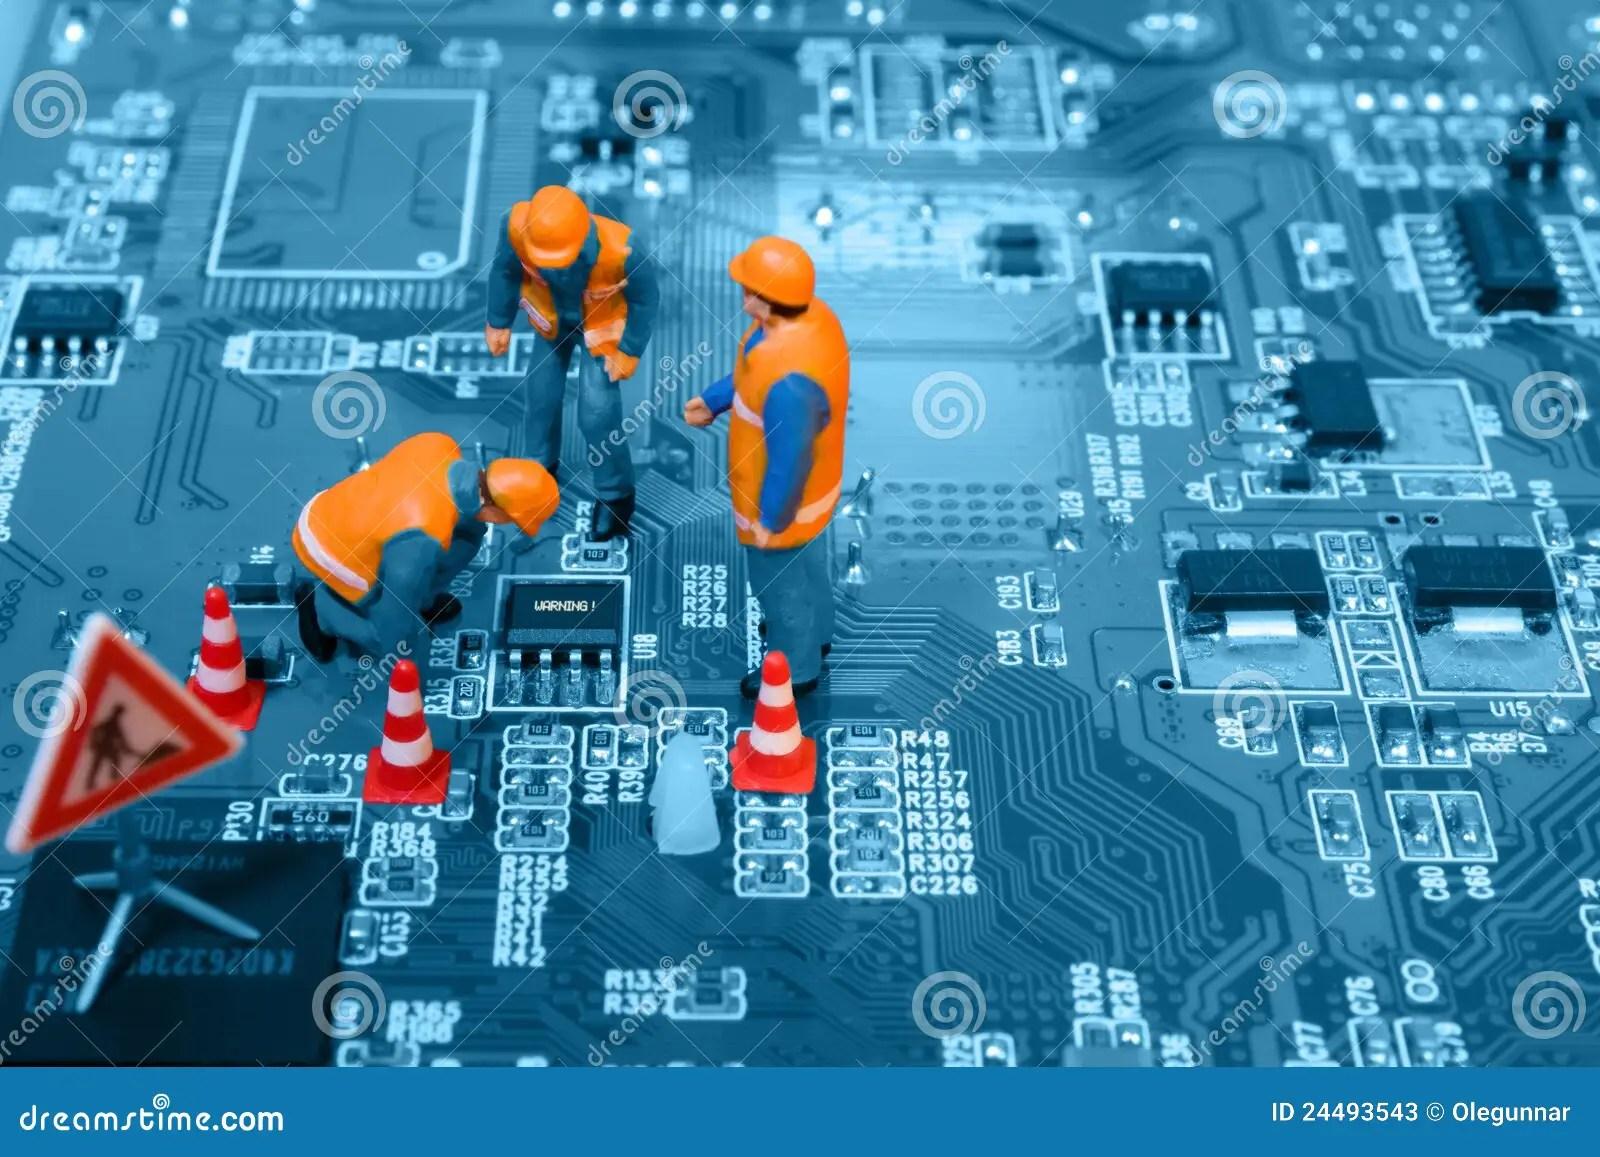 Computer Repair Concept Stock Photos  Image 24493543